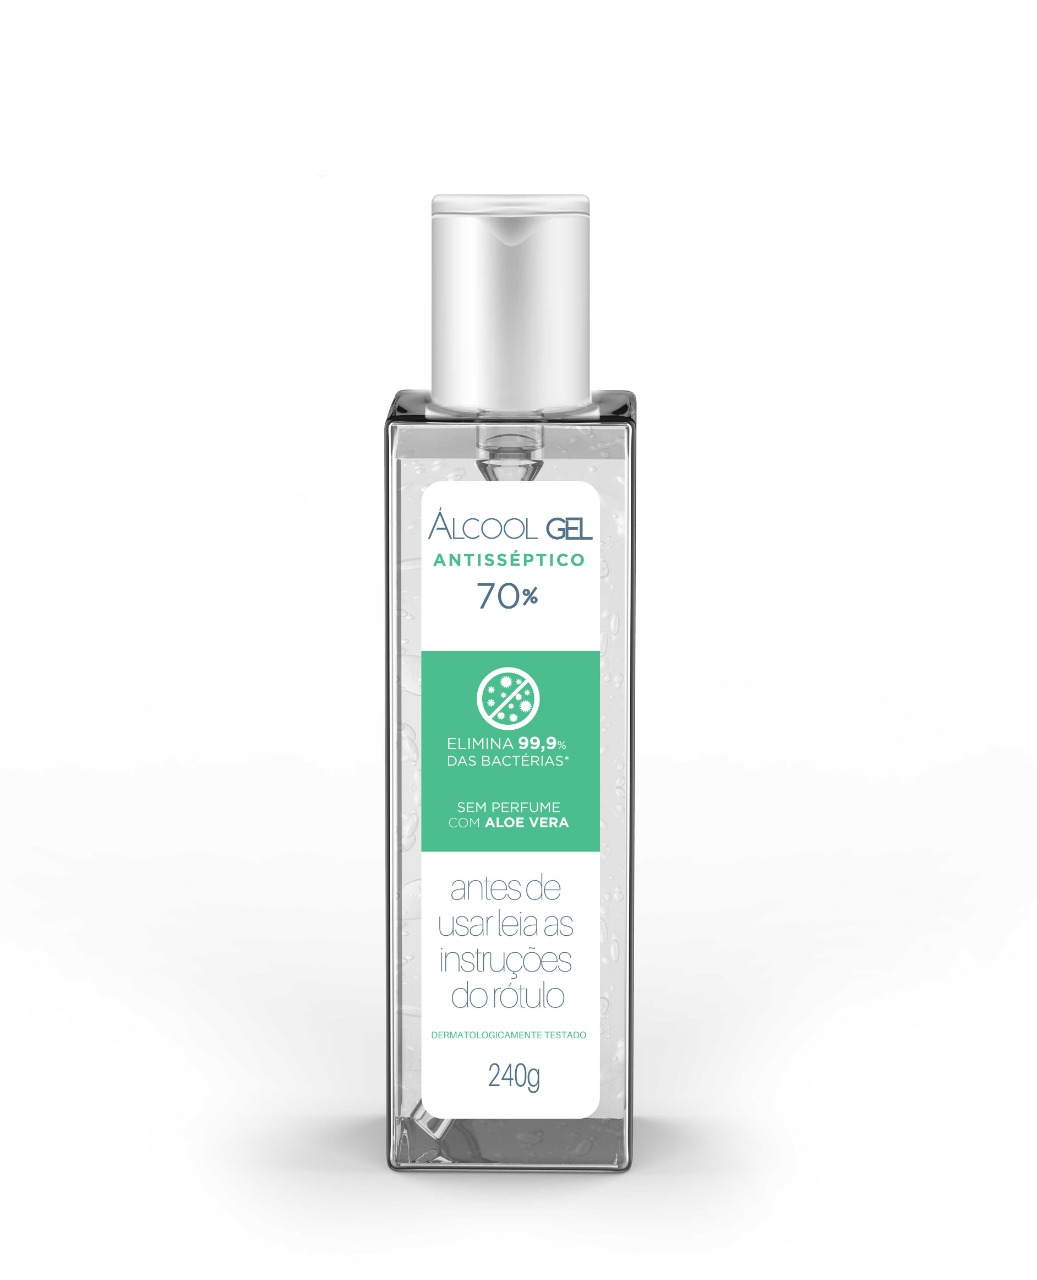 Alcool Gel 70% com Aloe Vera 240g